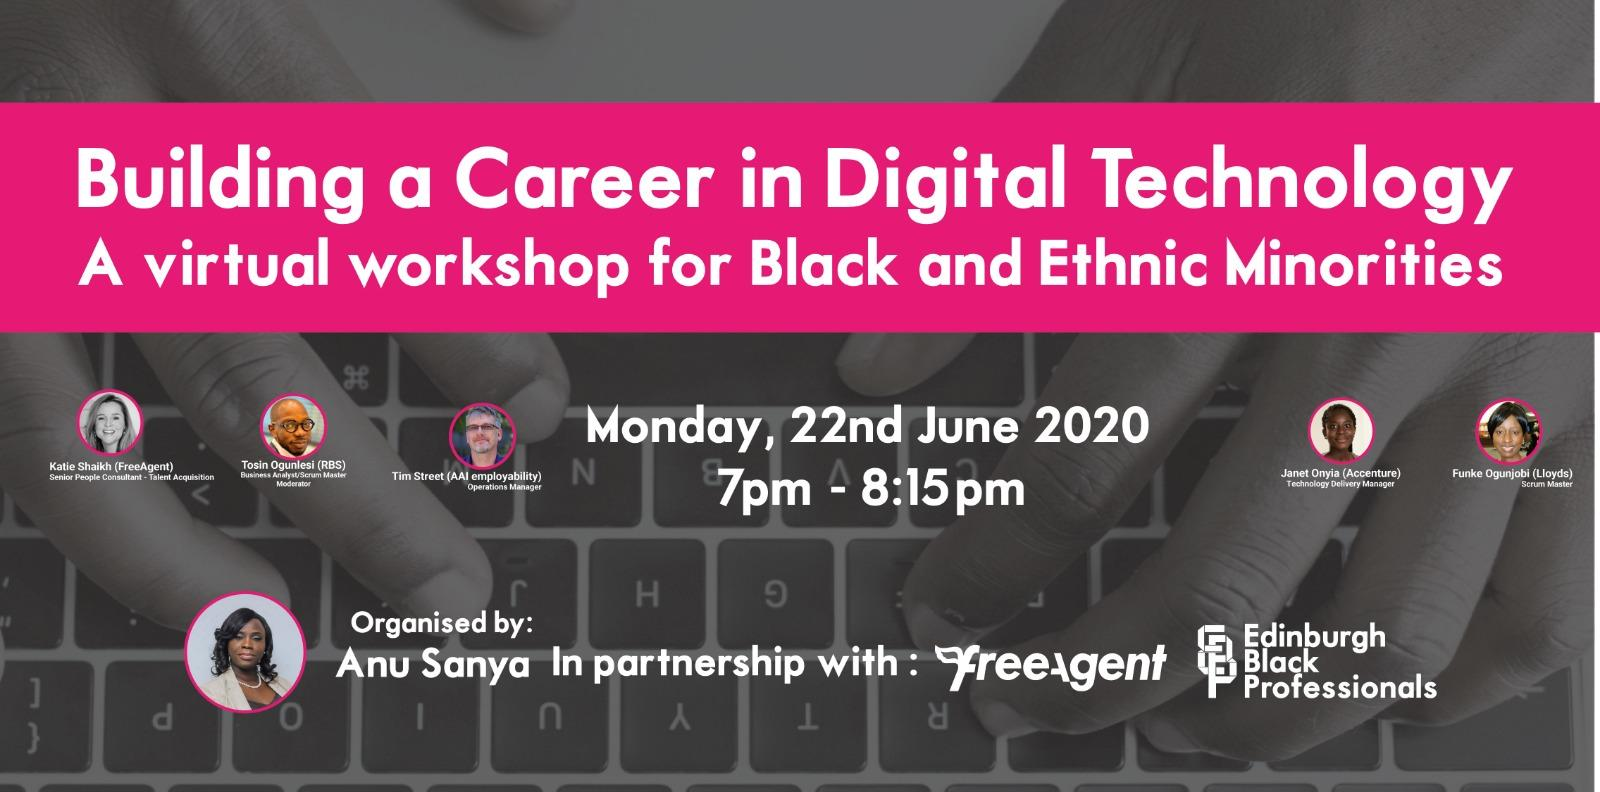 Career in Digital Technology flier